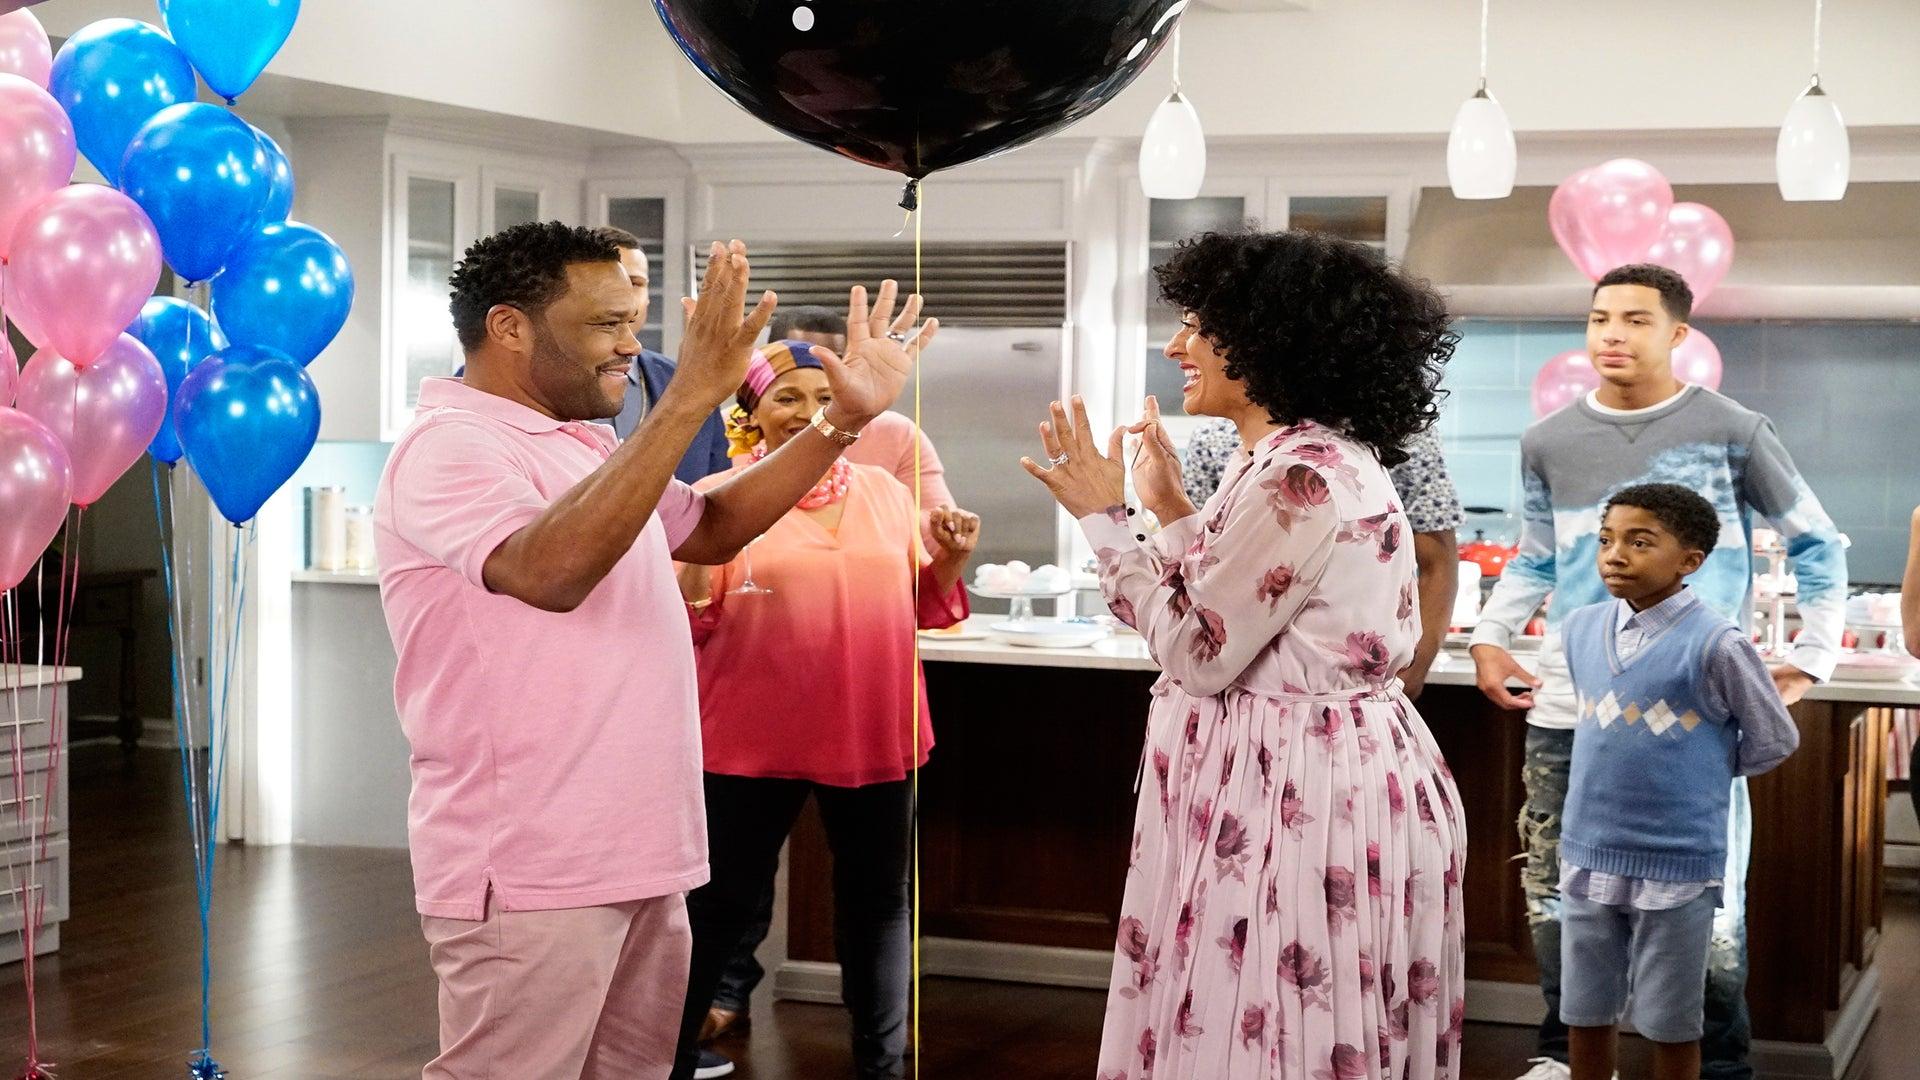 ABC Renews 'Black-ish' For Season 4